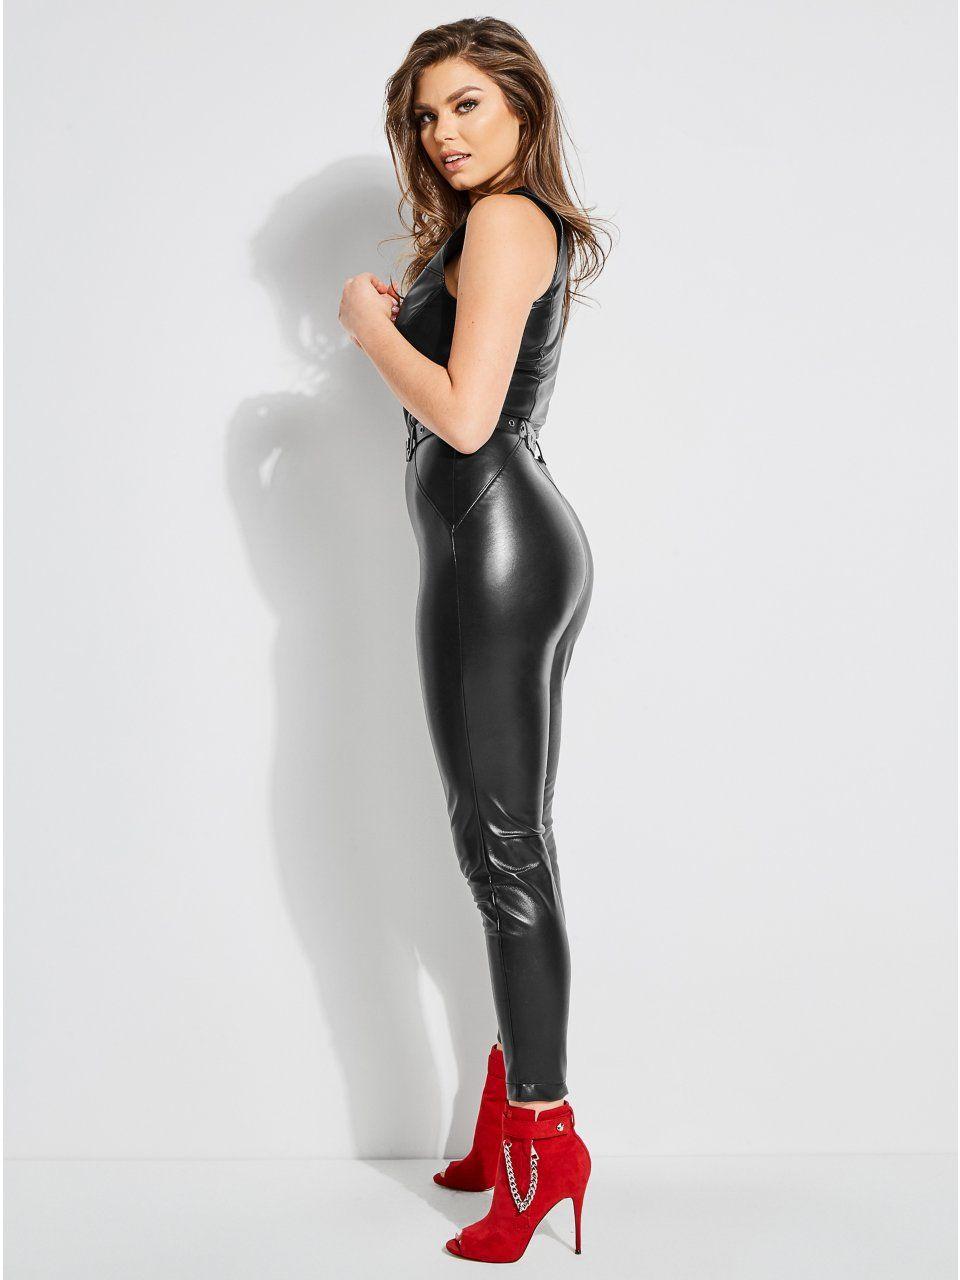 d0c35f4414e6 Sandra Zip-Front Moto Jumpsuit. Sandra Zip-Front Moto Jumpsuit Leather  Catsuit ...